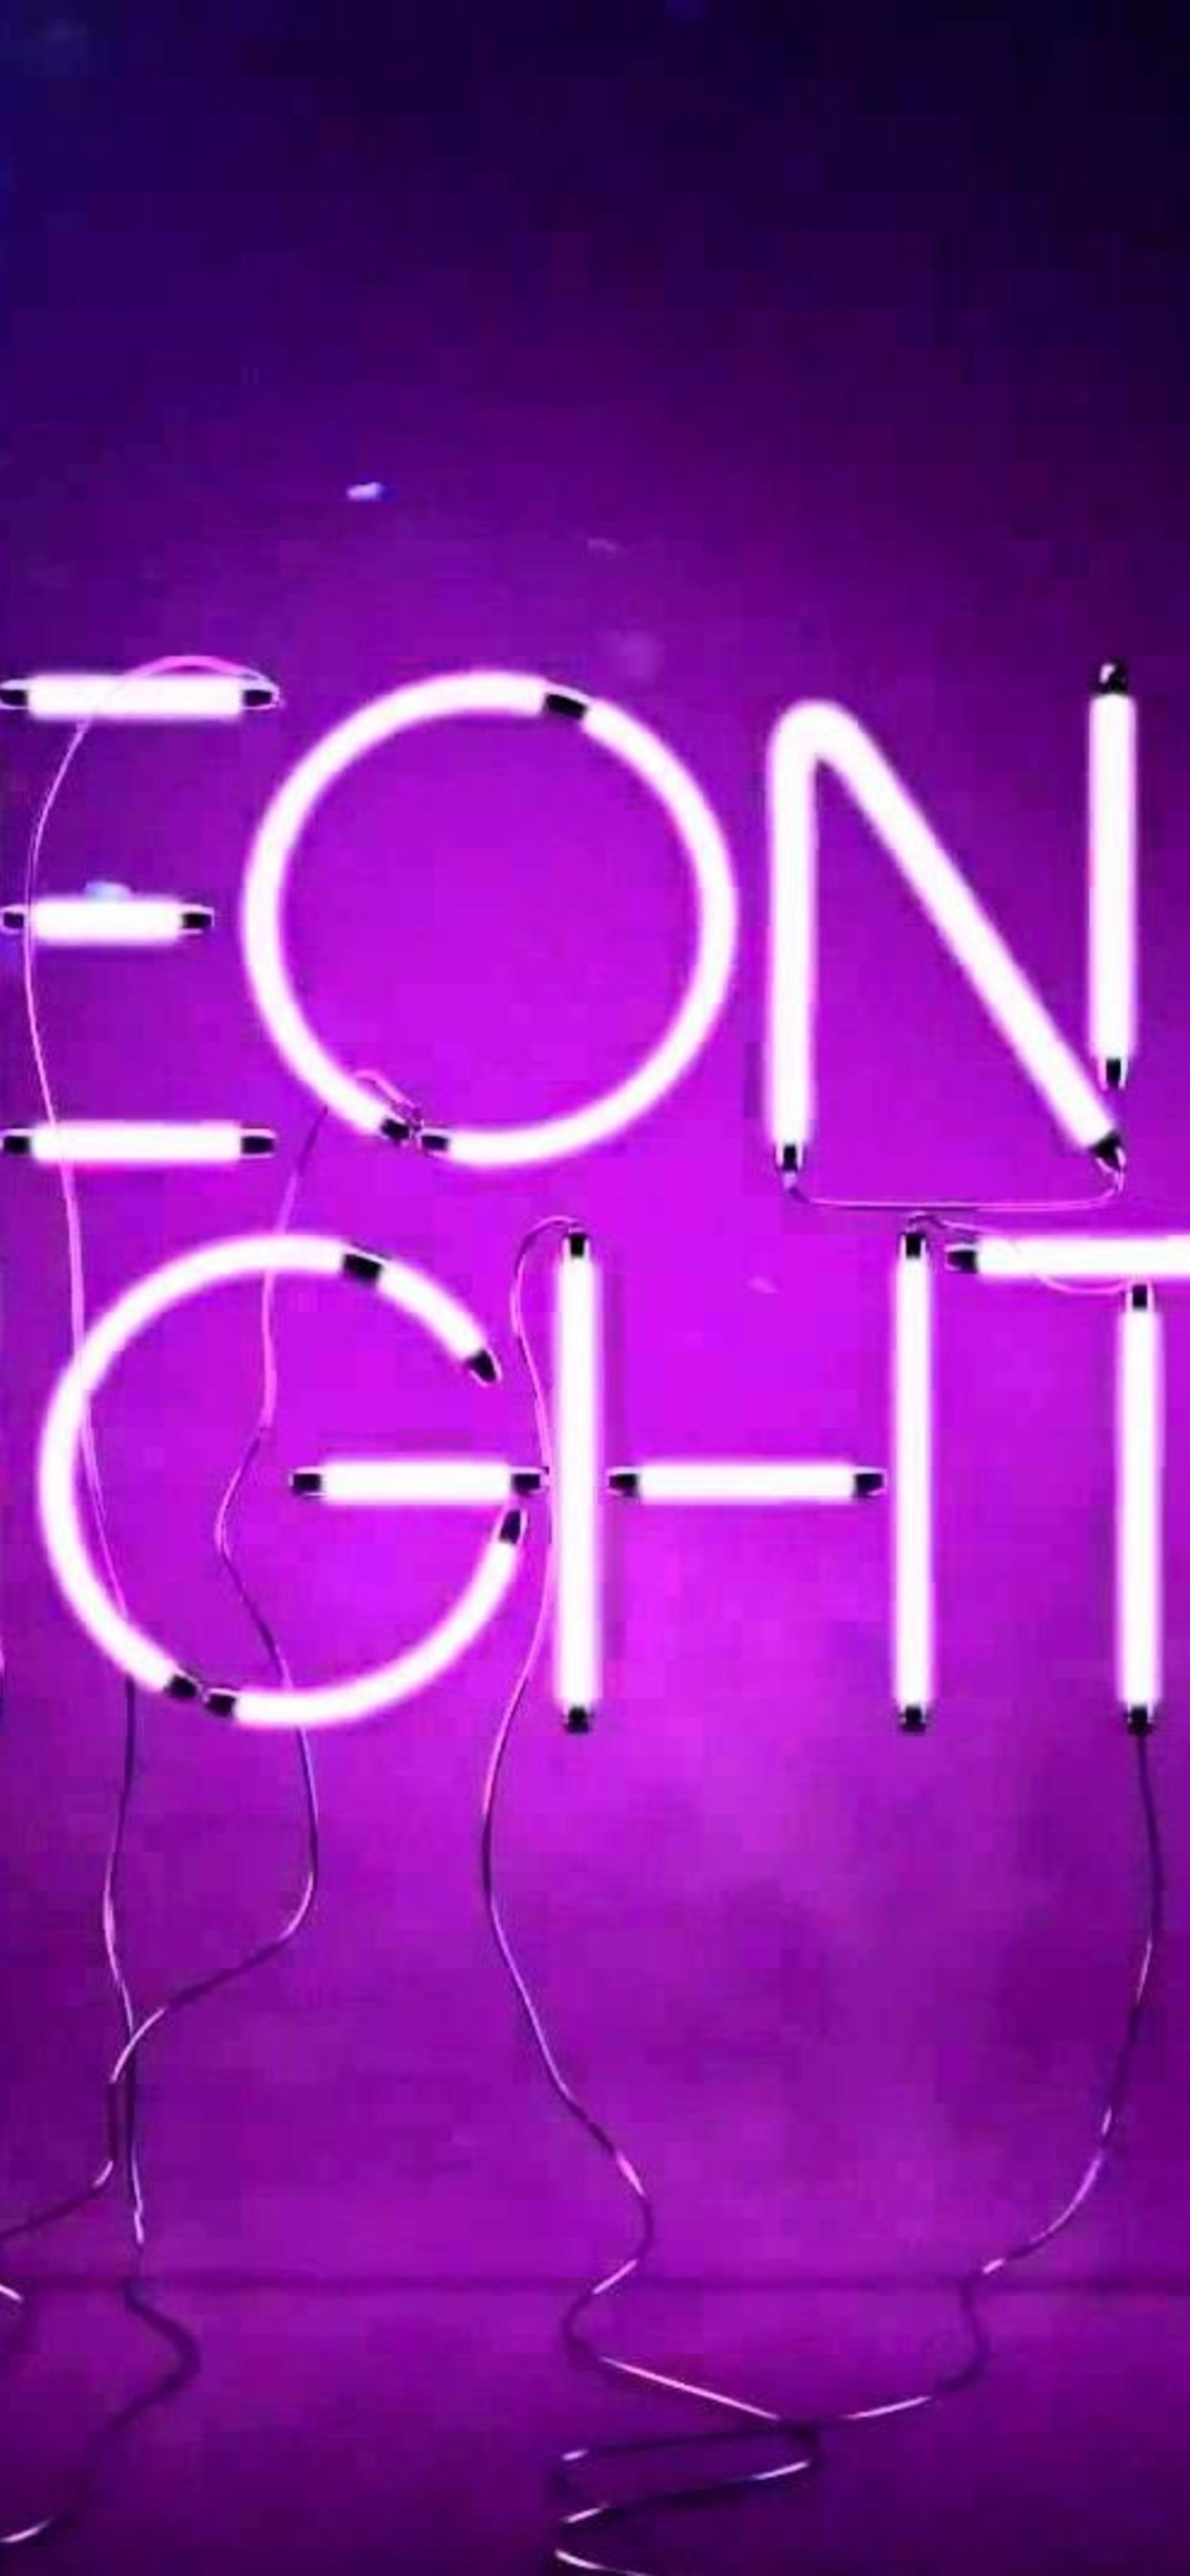 Neon Lights   Data Src Neon Lights Iphone Wallpaper - Neon Iphone Xs Max - HD Wallpaper